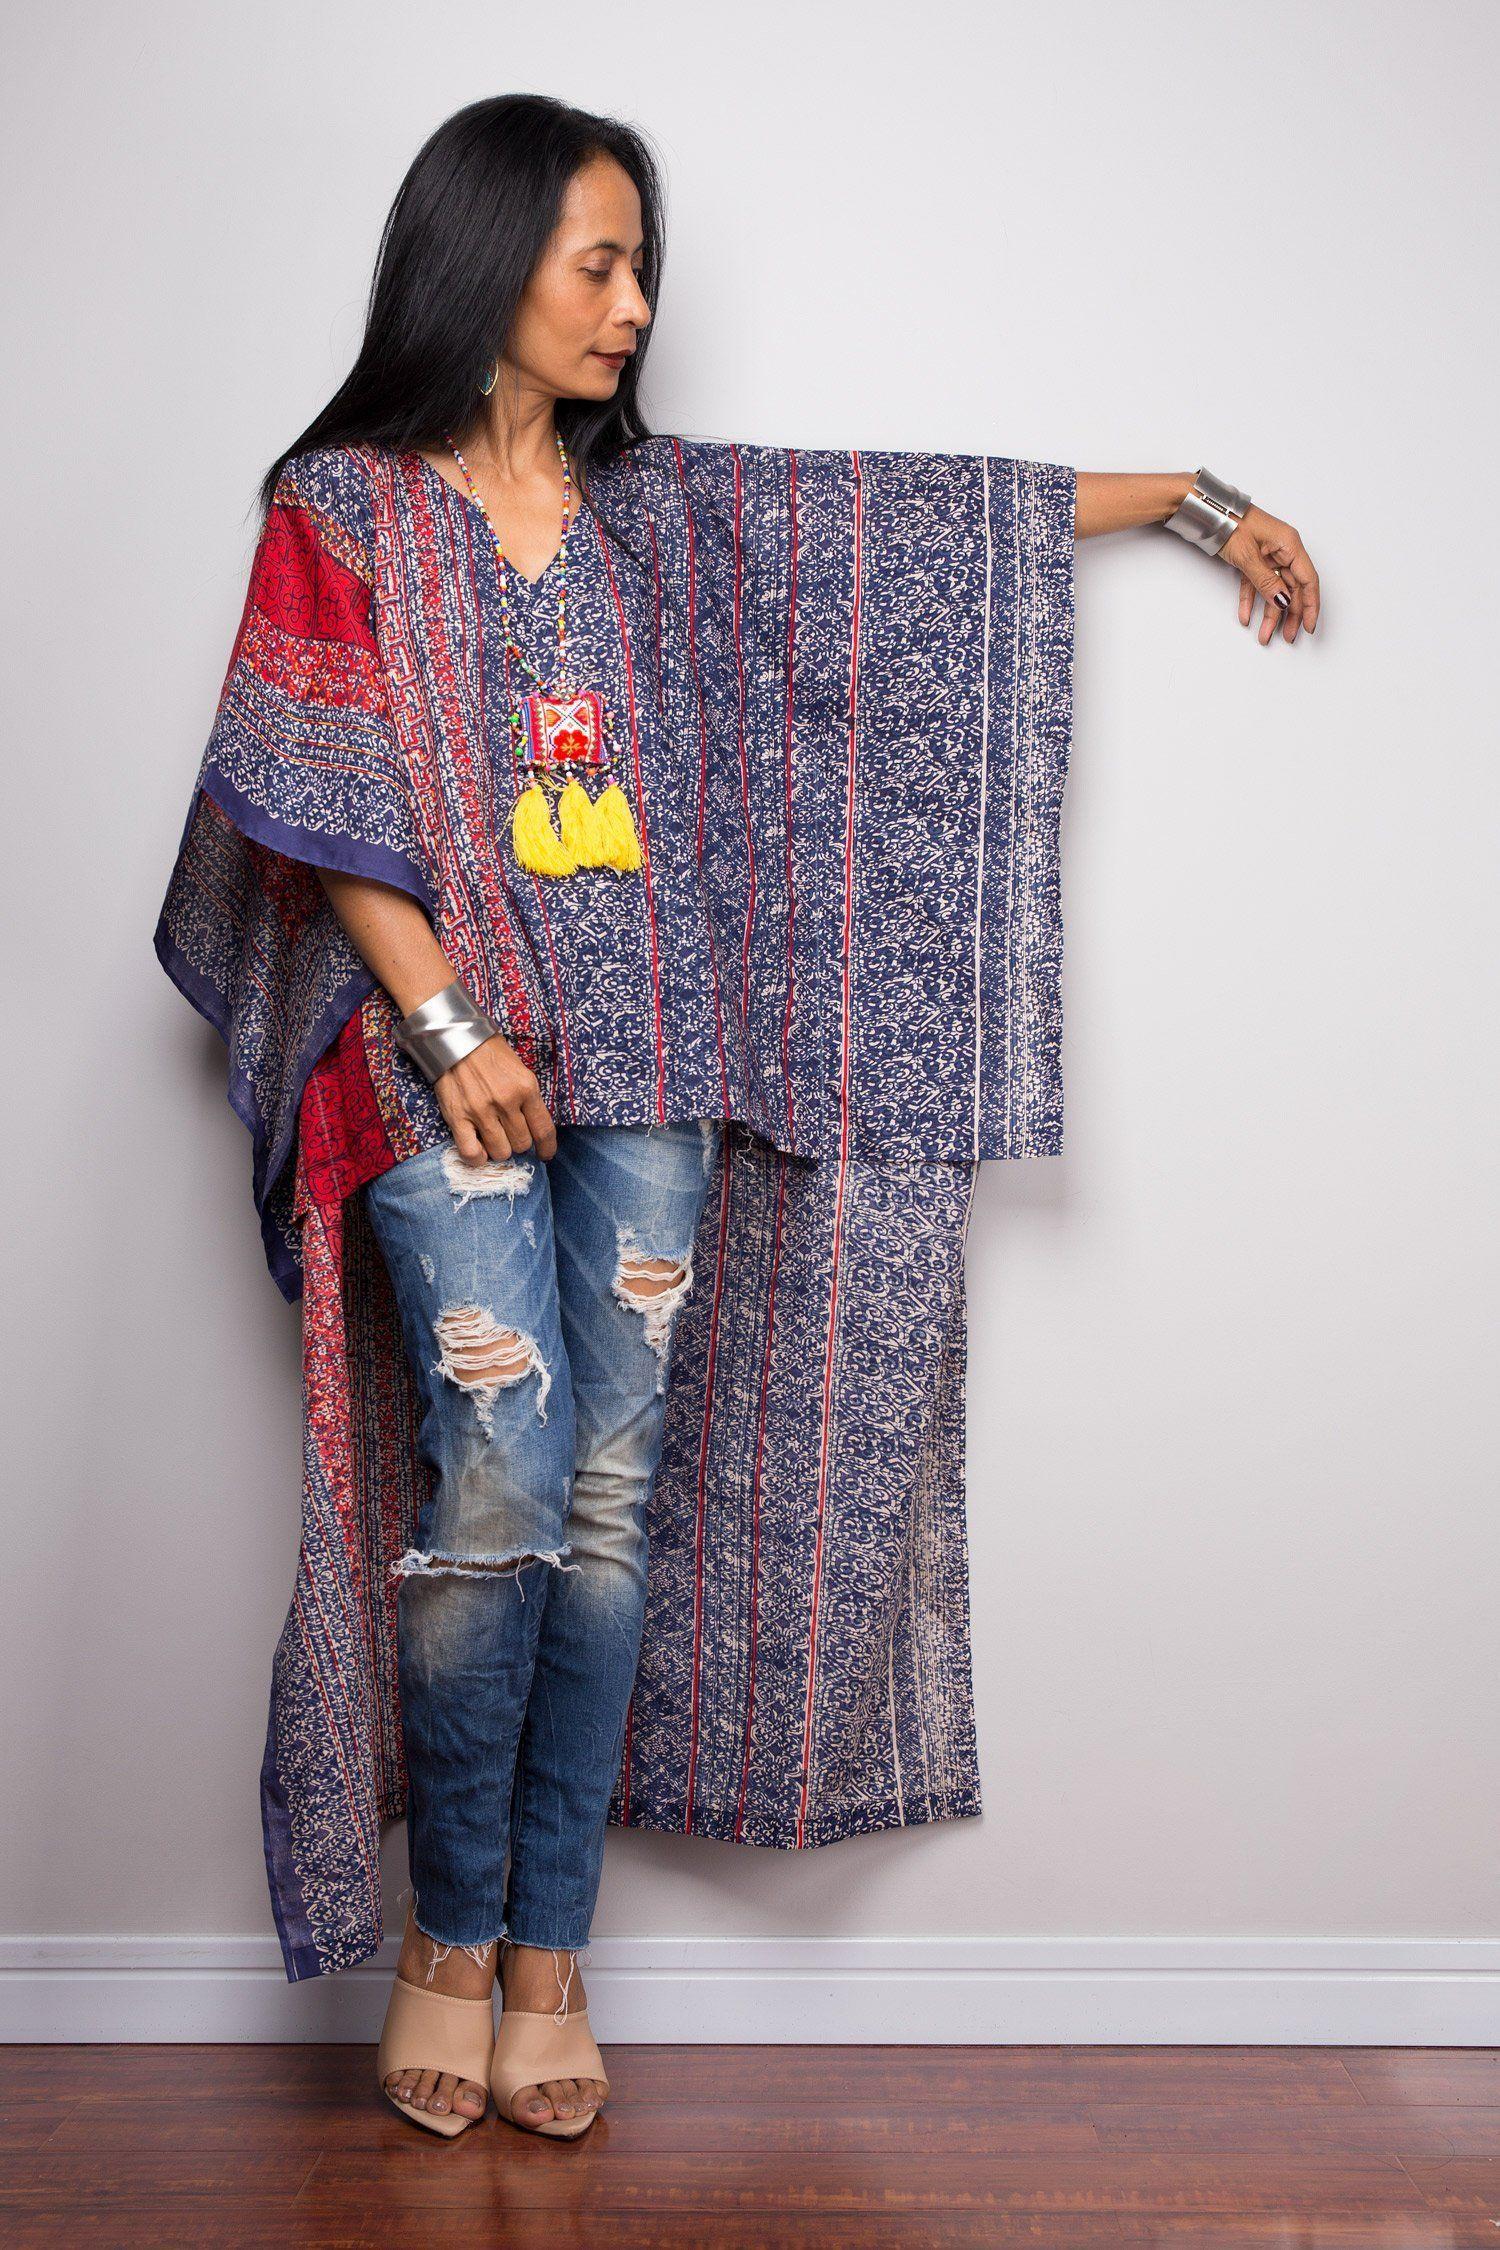 af1cdea992 Boho Kaftan top | Cotton Tunic top | beachwear tunic | Short front poncho top  dress